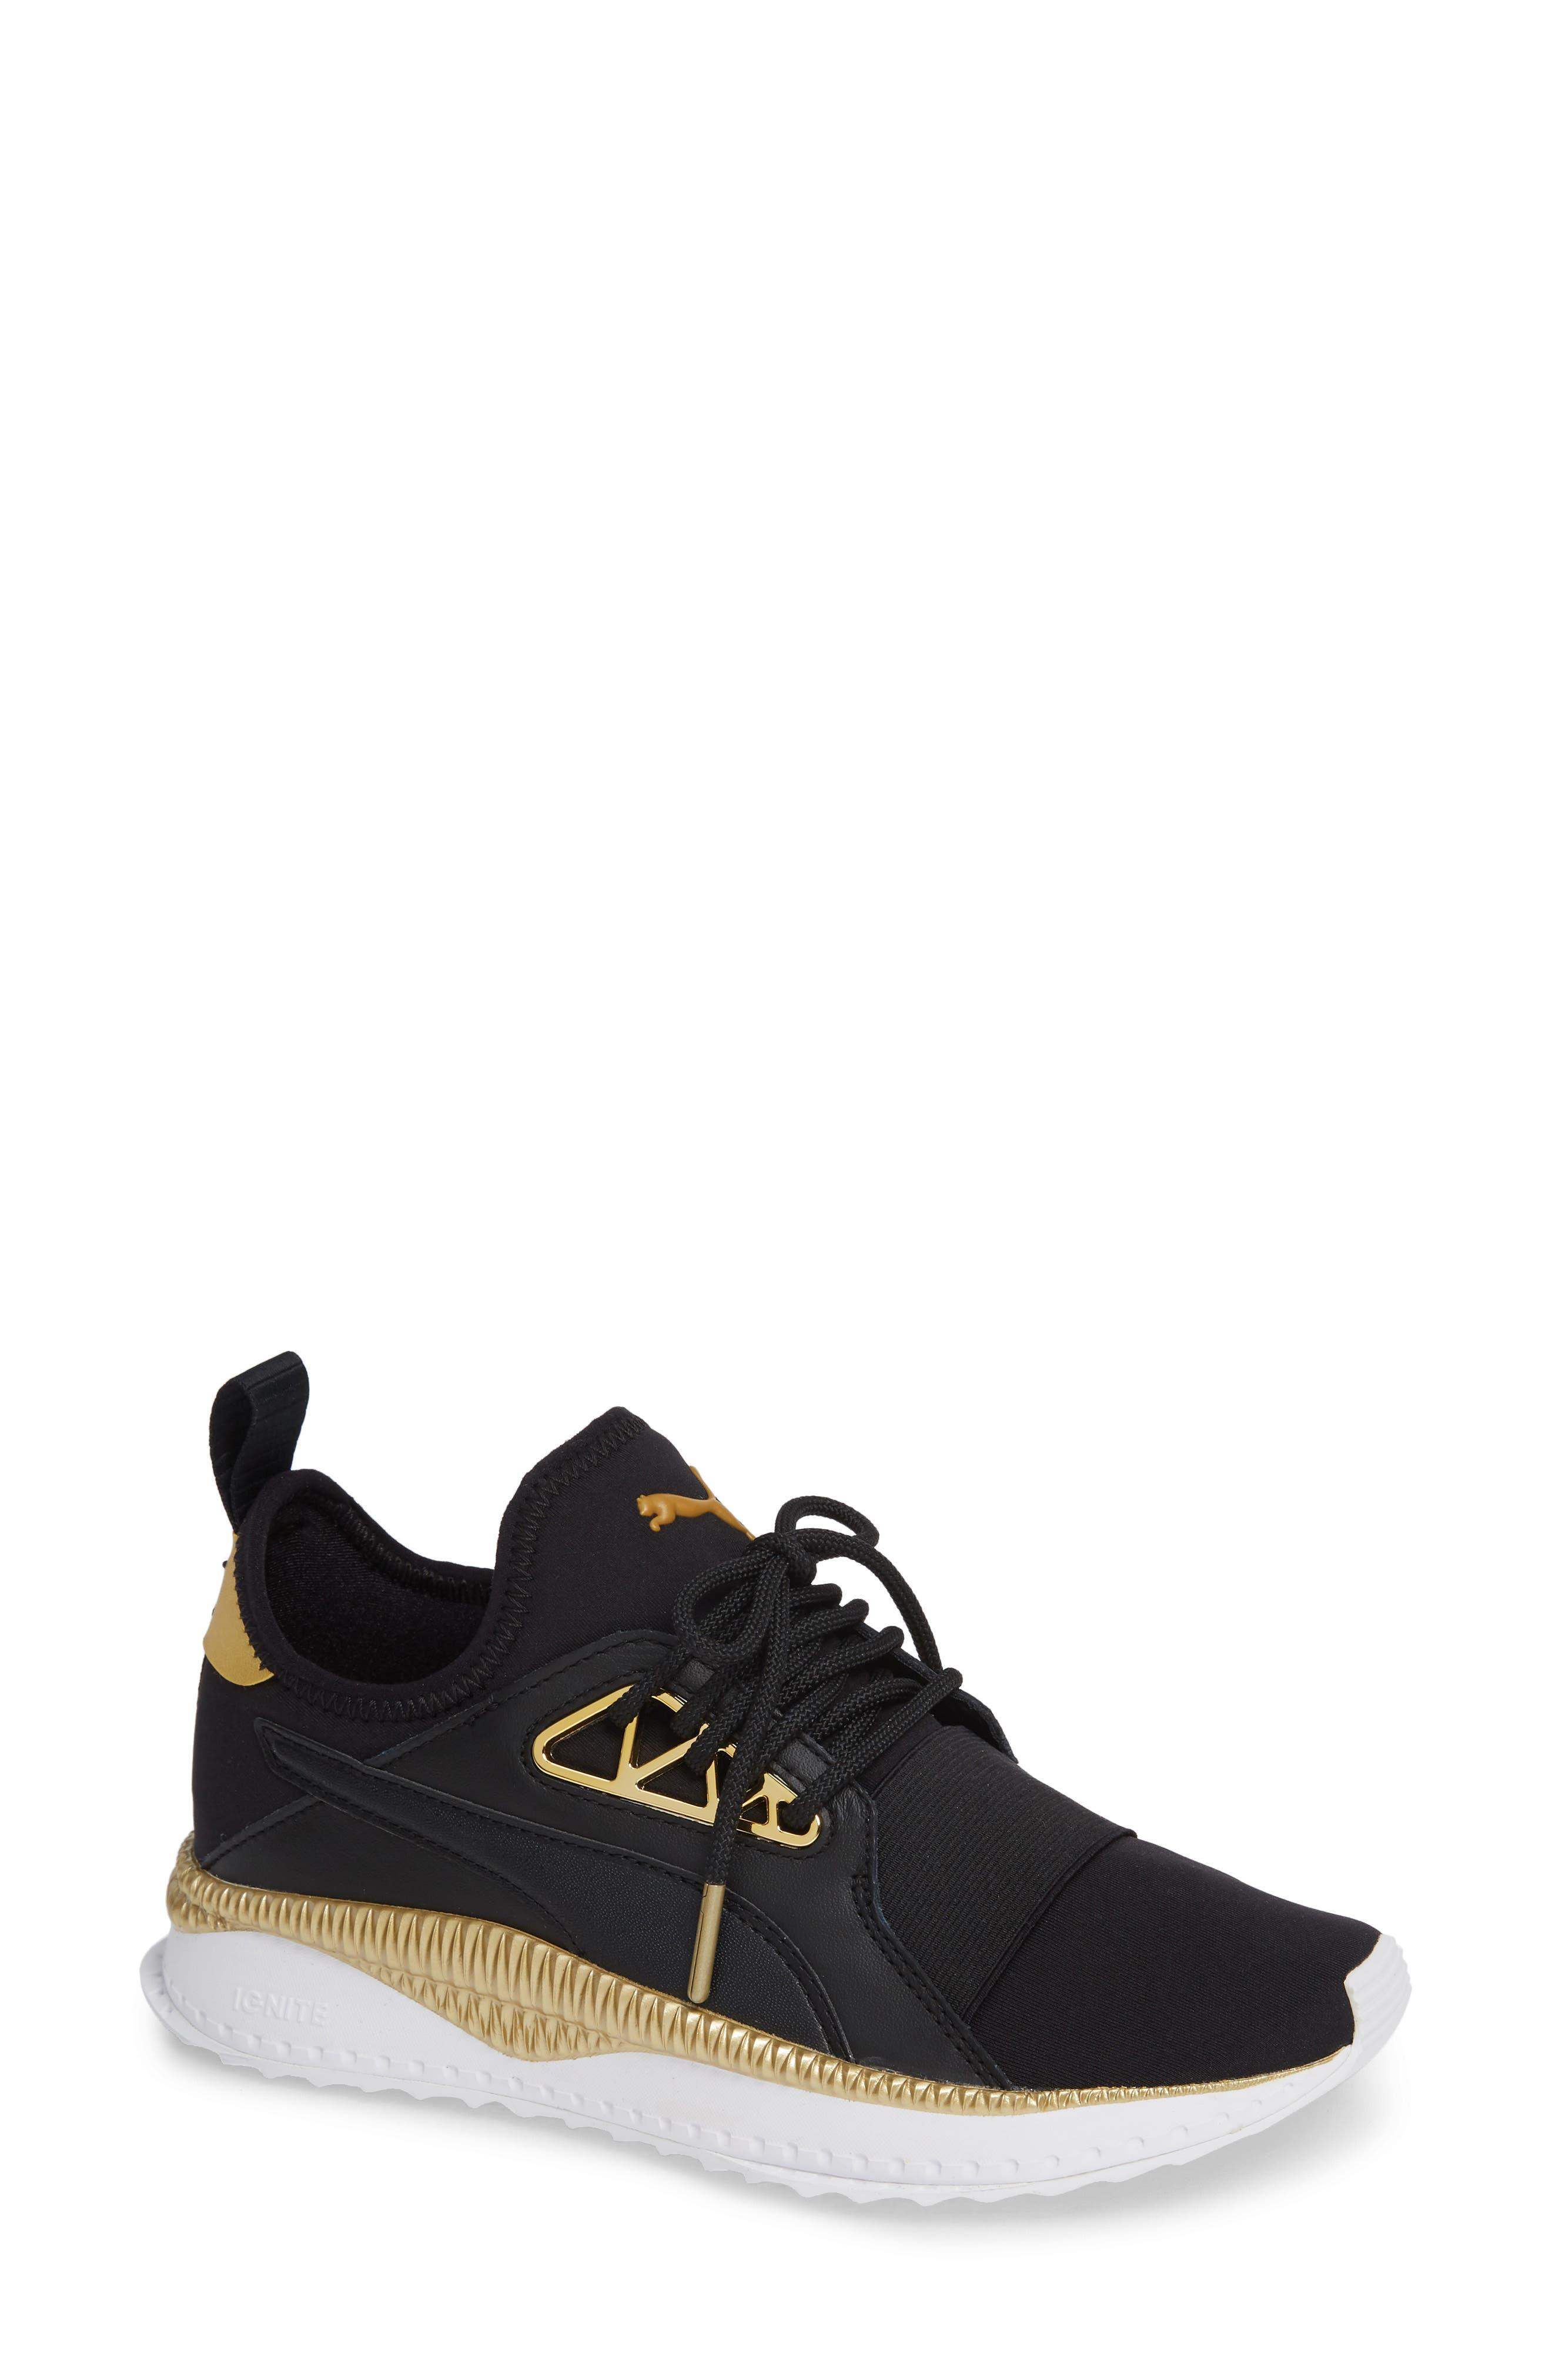 TSUGI Apex Jewel Sneaker,                             Main thumbnail 1, color,                             PUMA BLACK/ PUMA BLACK